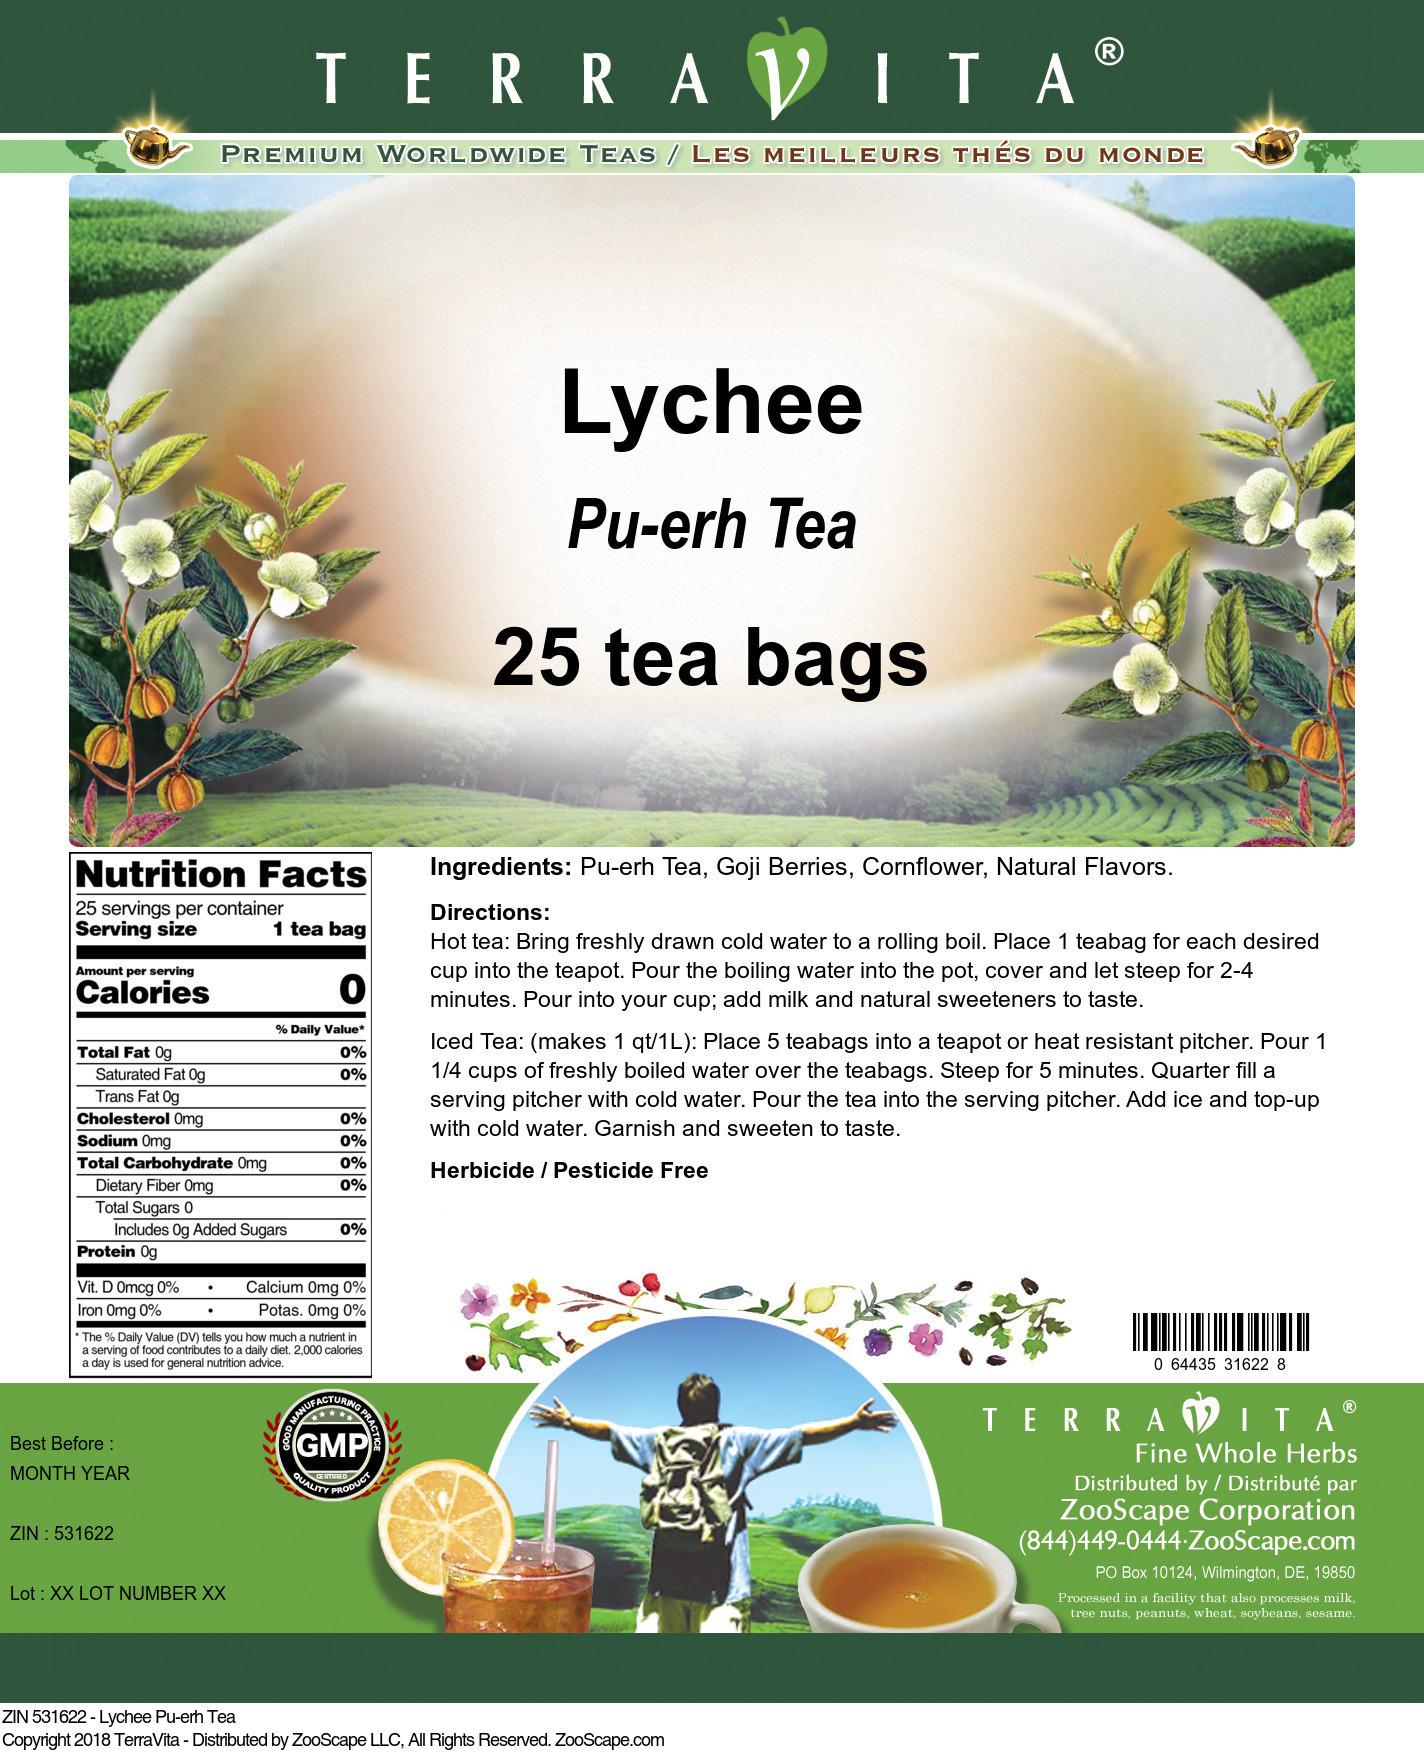 Lychee Pu-erh Tea